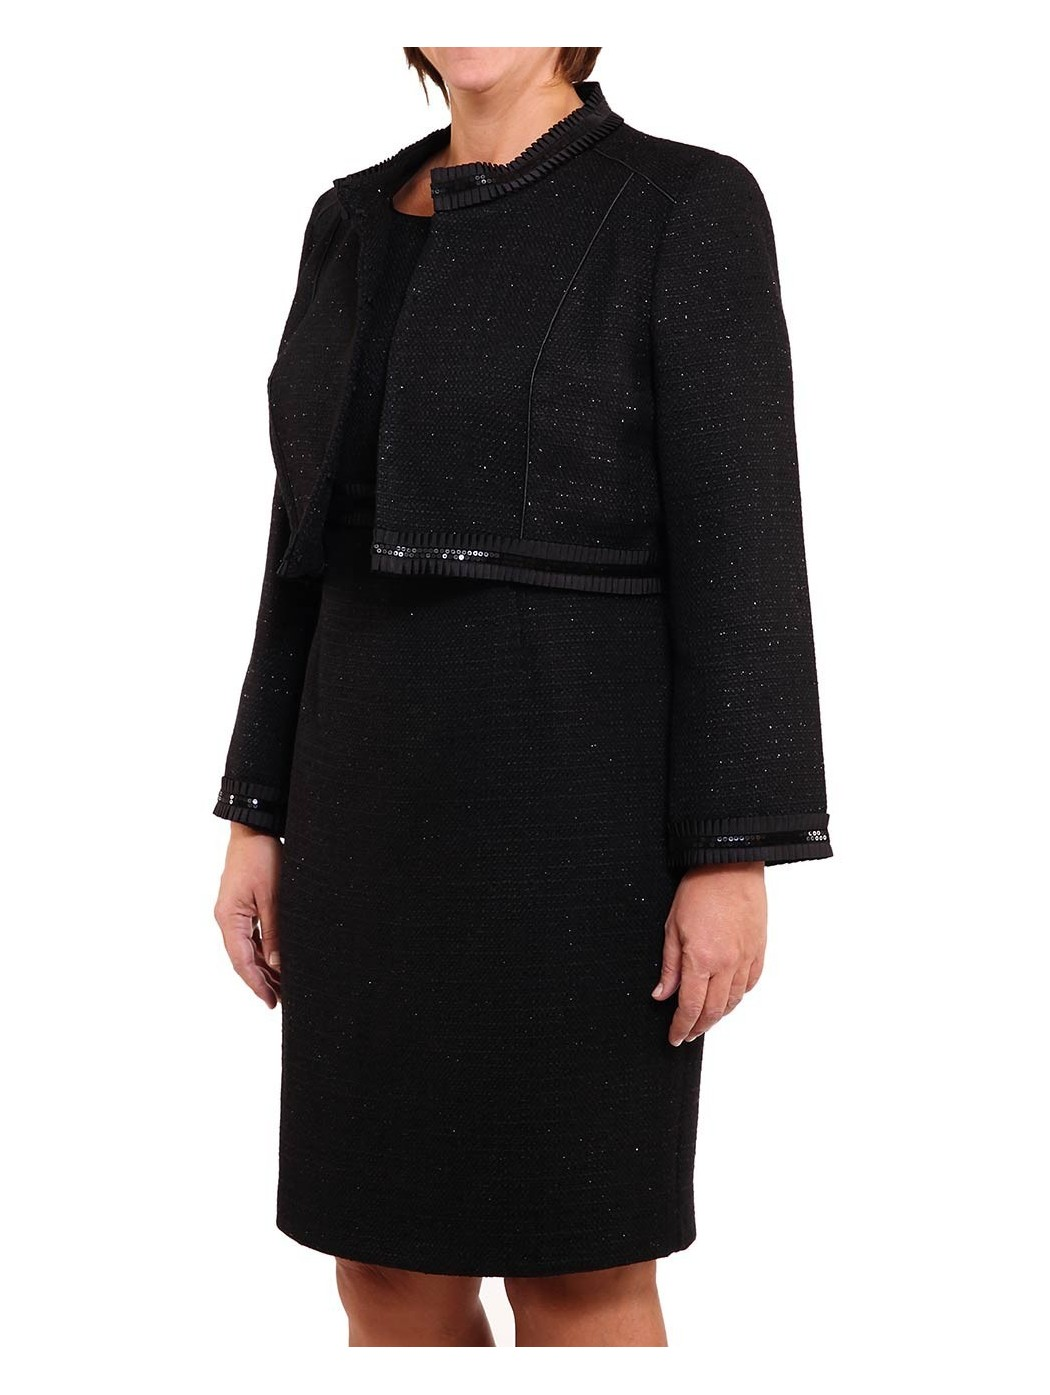 Sonia Peña dress and jacket